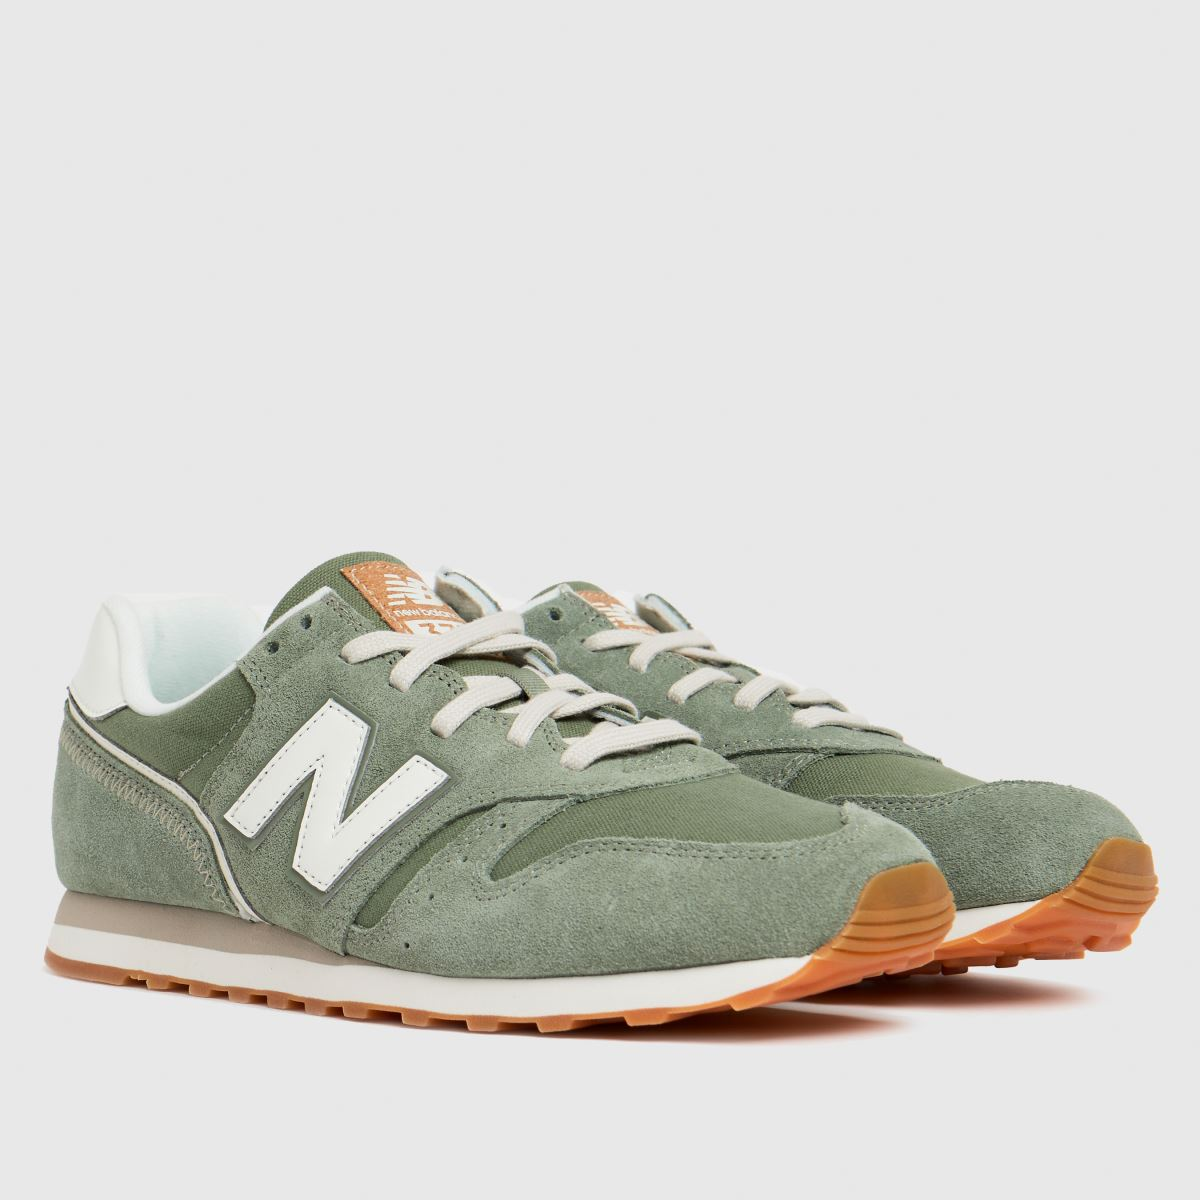 New balance khaki 373 trainers